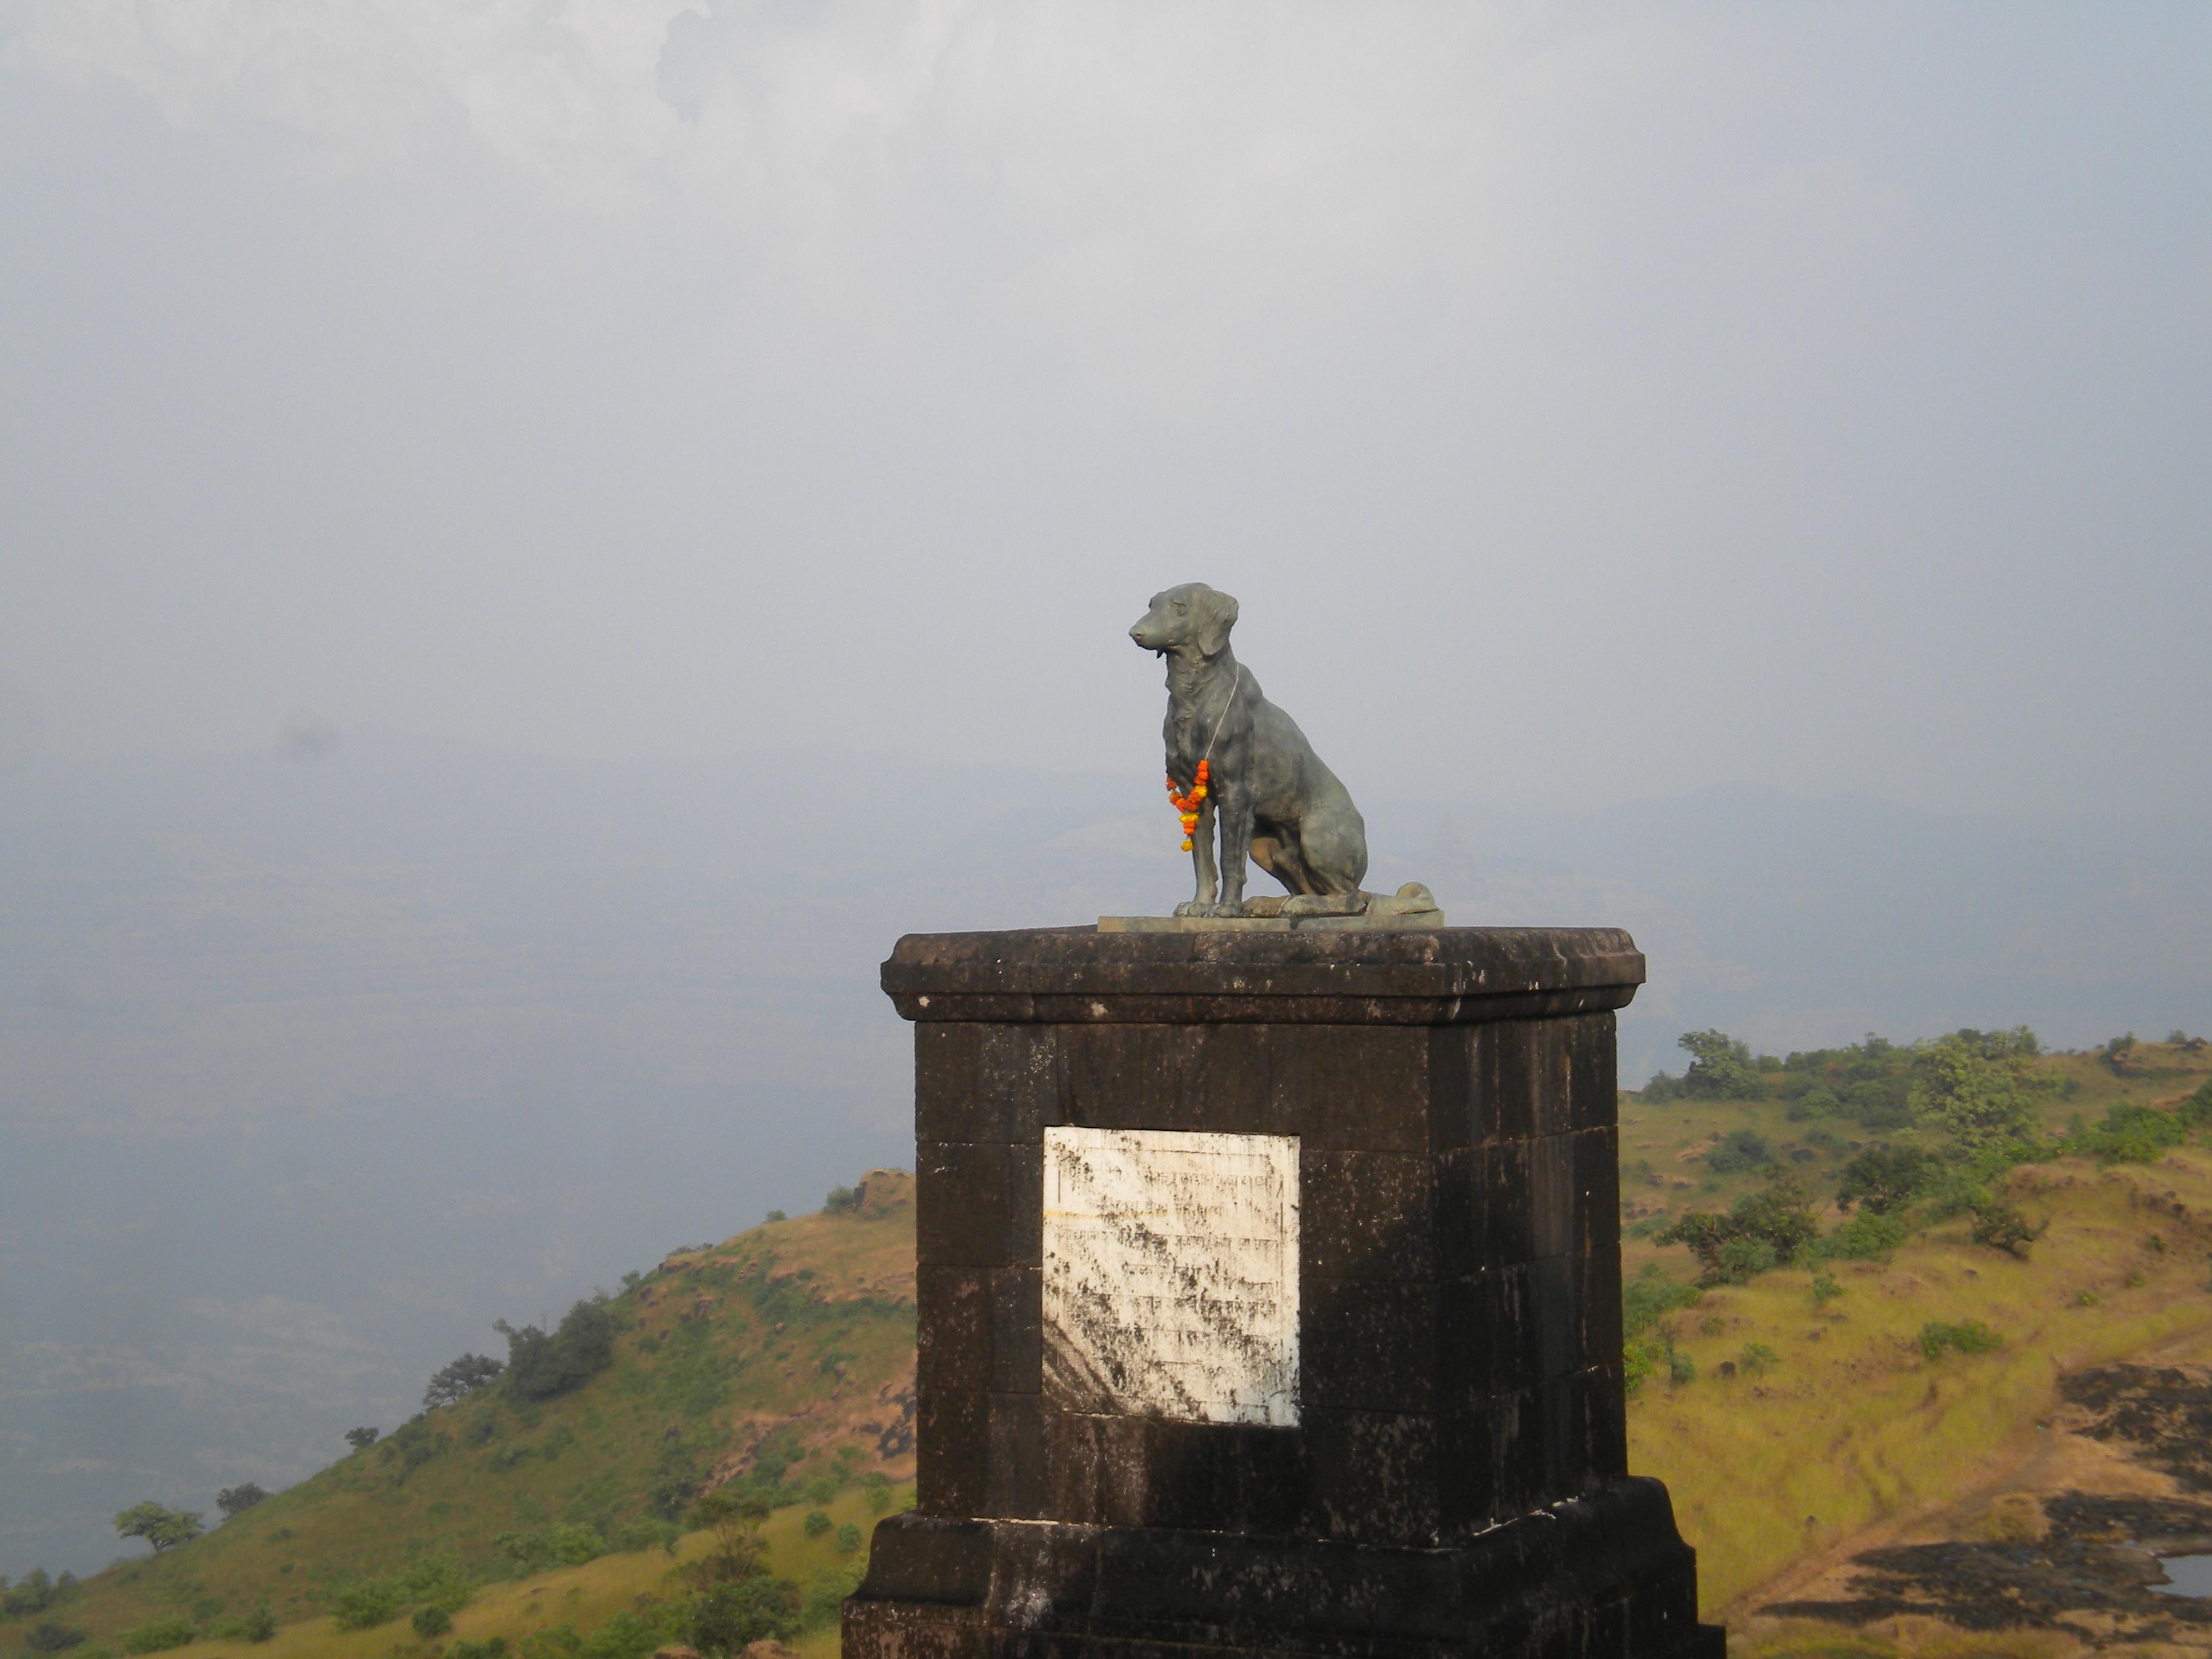 File:Raigad Sivaji's Waghya Samadhi 01.JPG - Wikipedia, the free